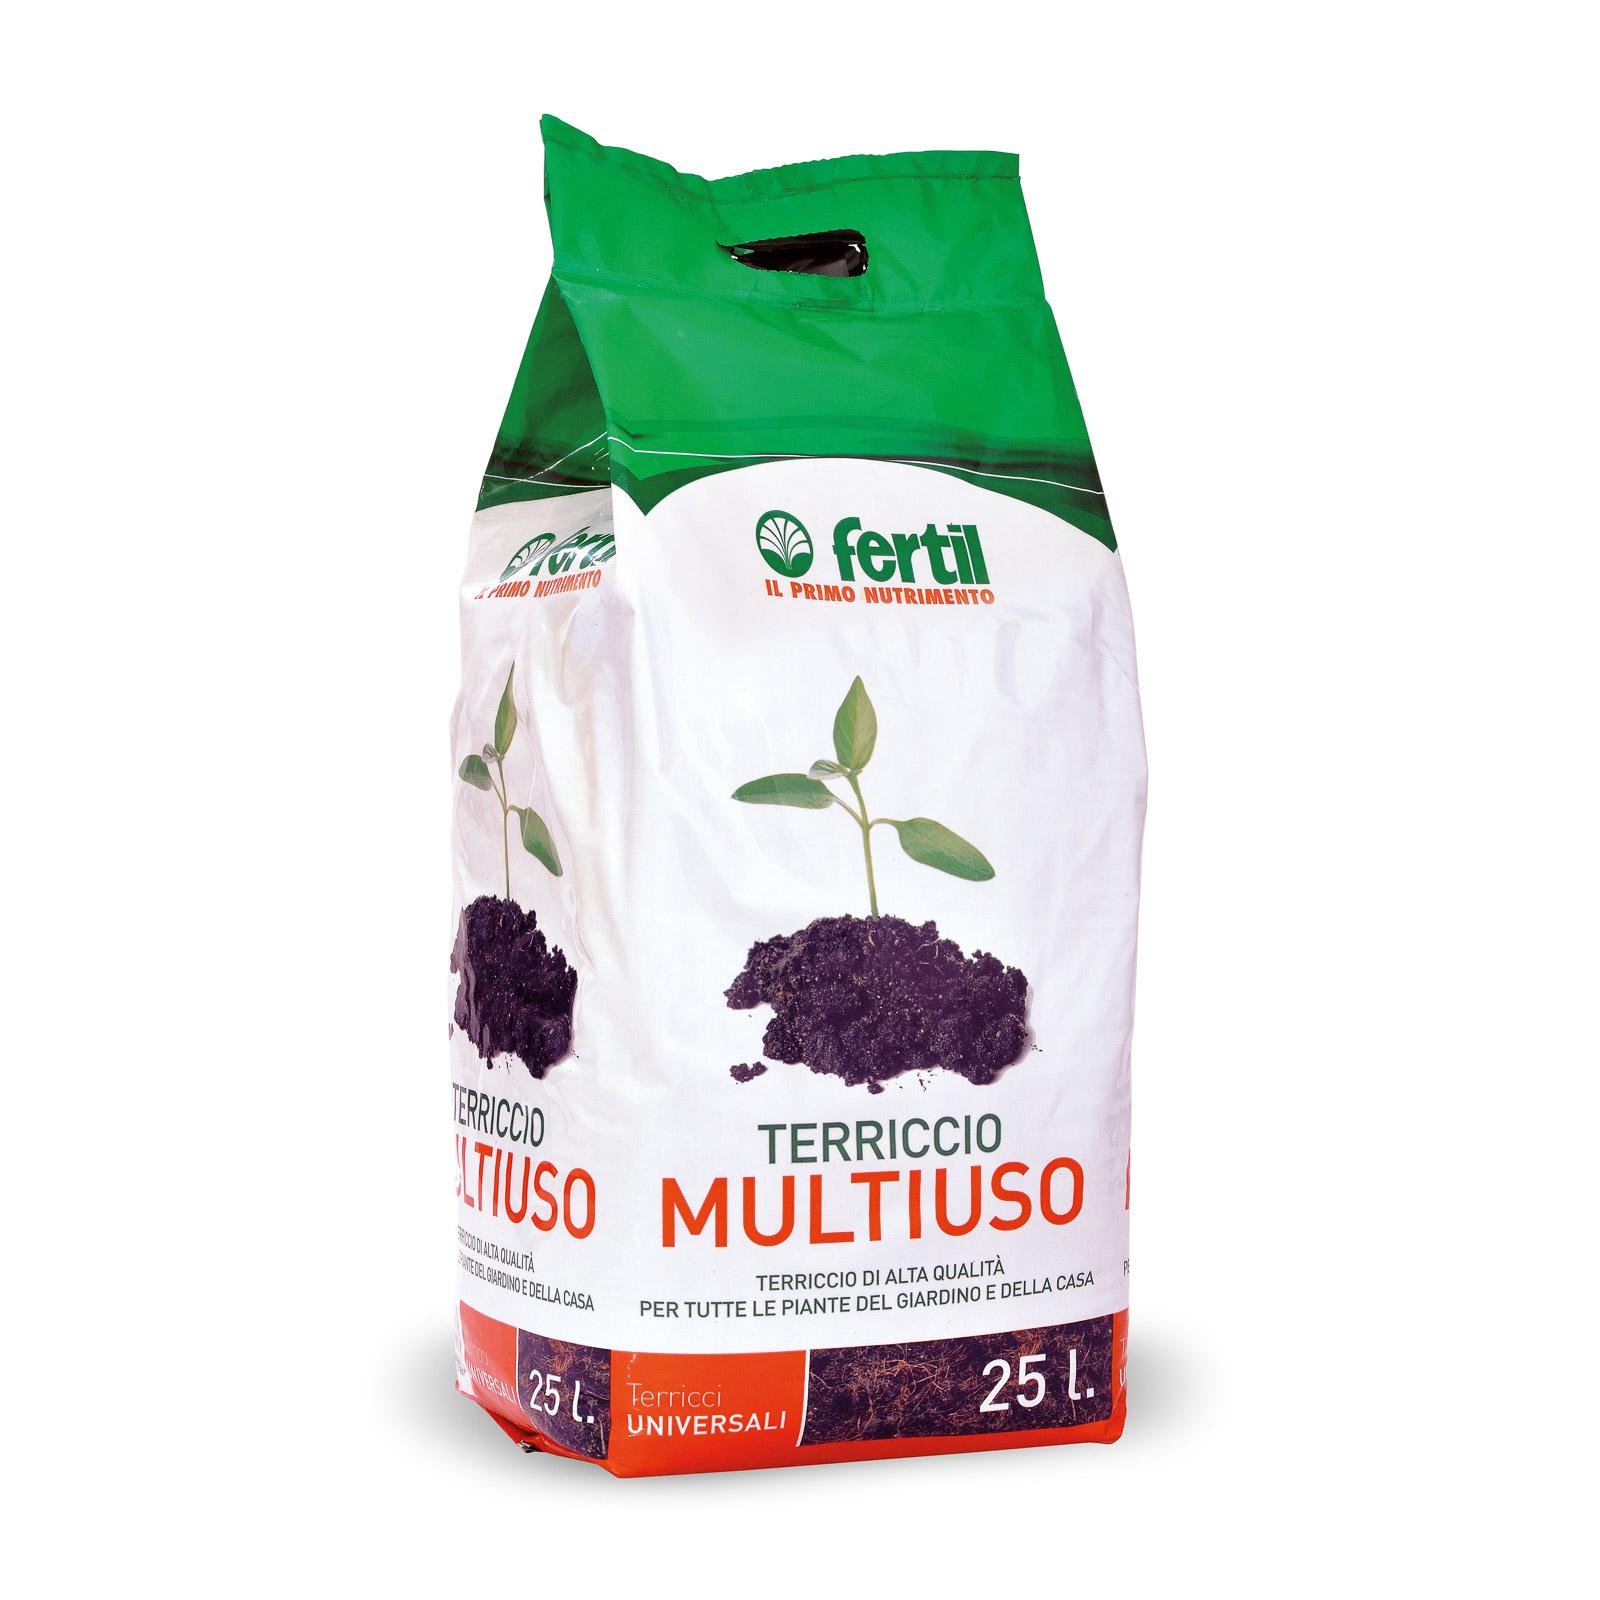 Terriccio multiuso fertil for Viridea catalogo